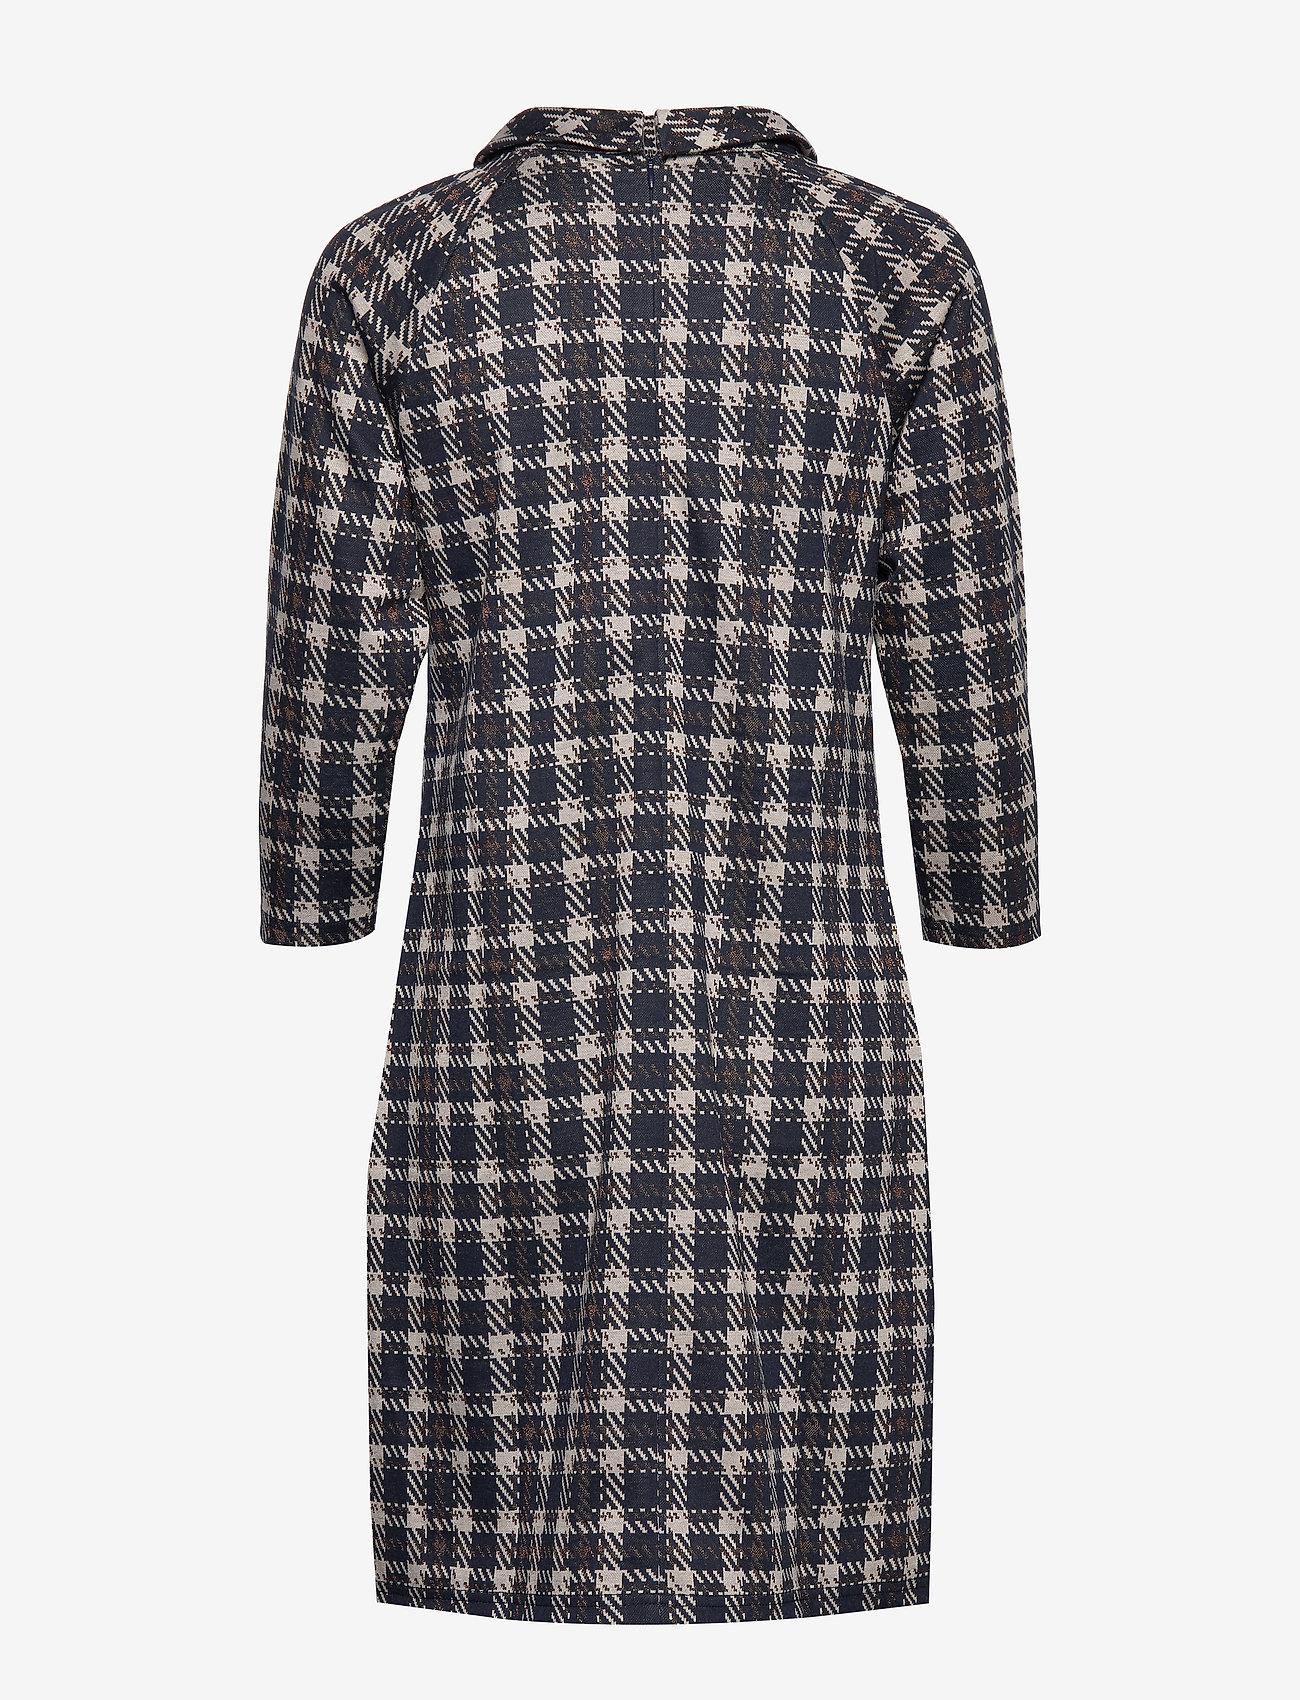 Dress Short 3/4 Sleeve (Dark Blue/brown) - Betty Barclay fXFpSE